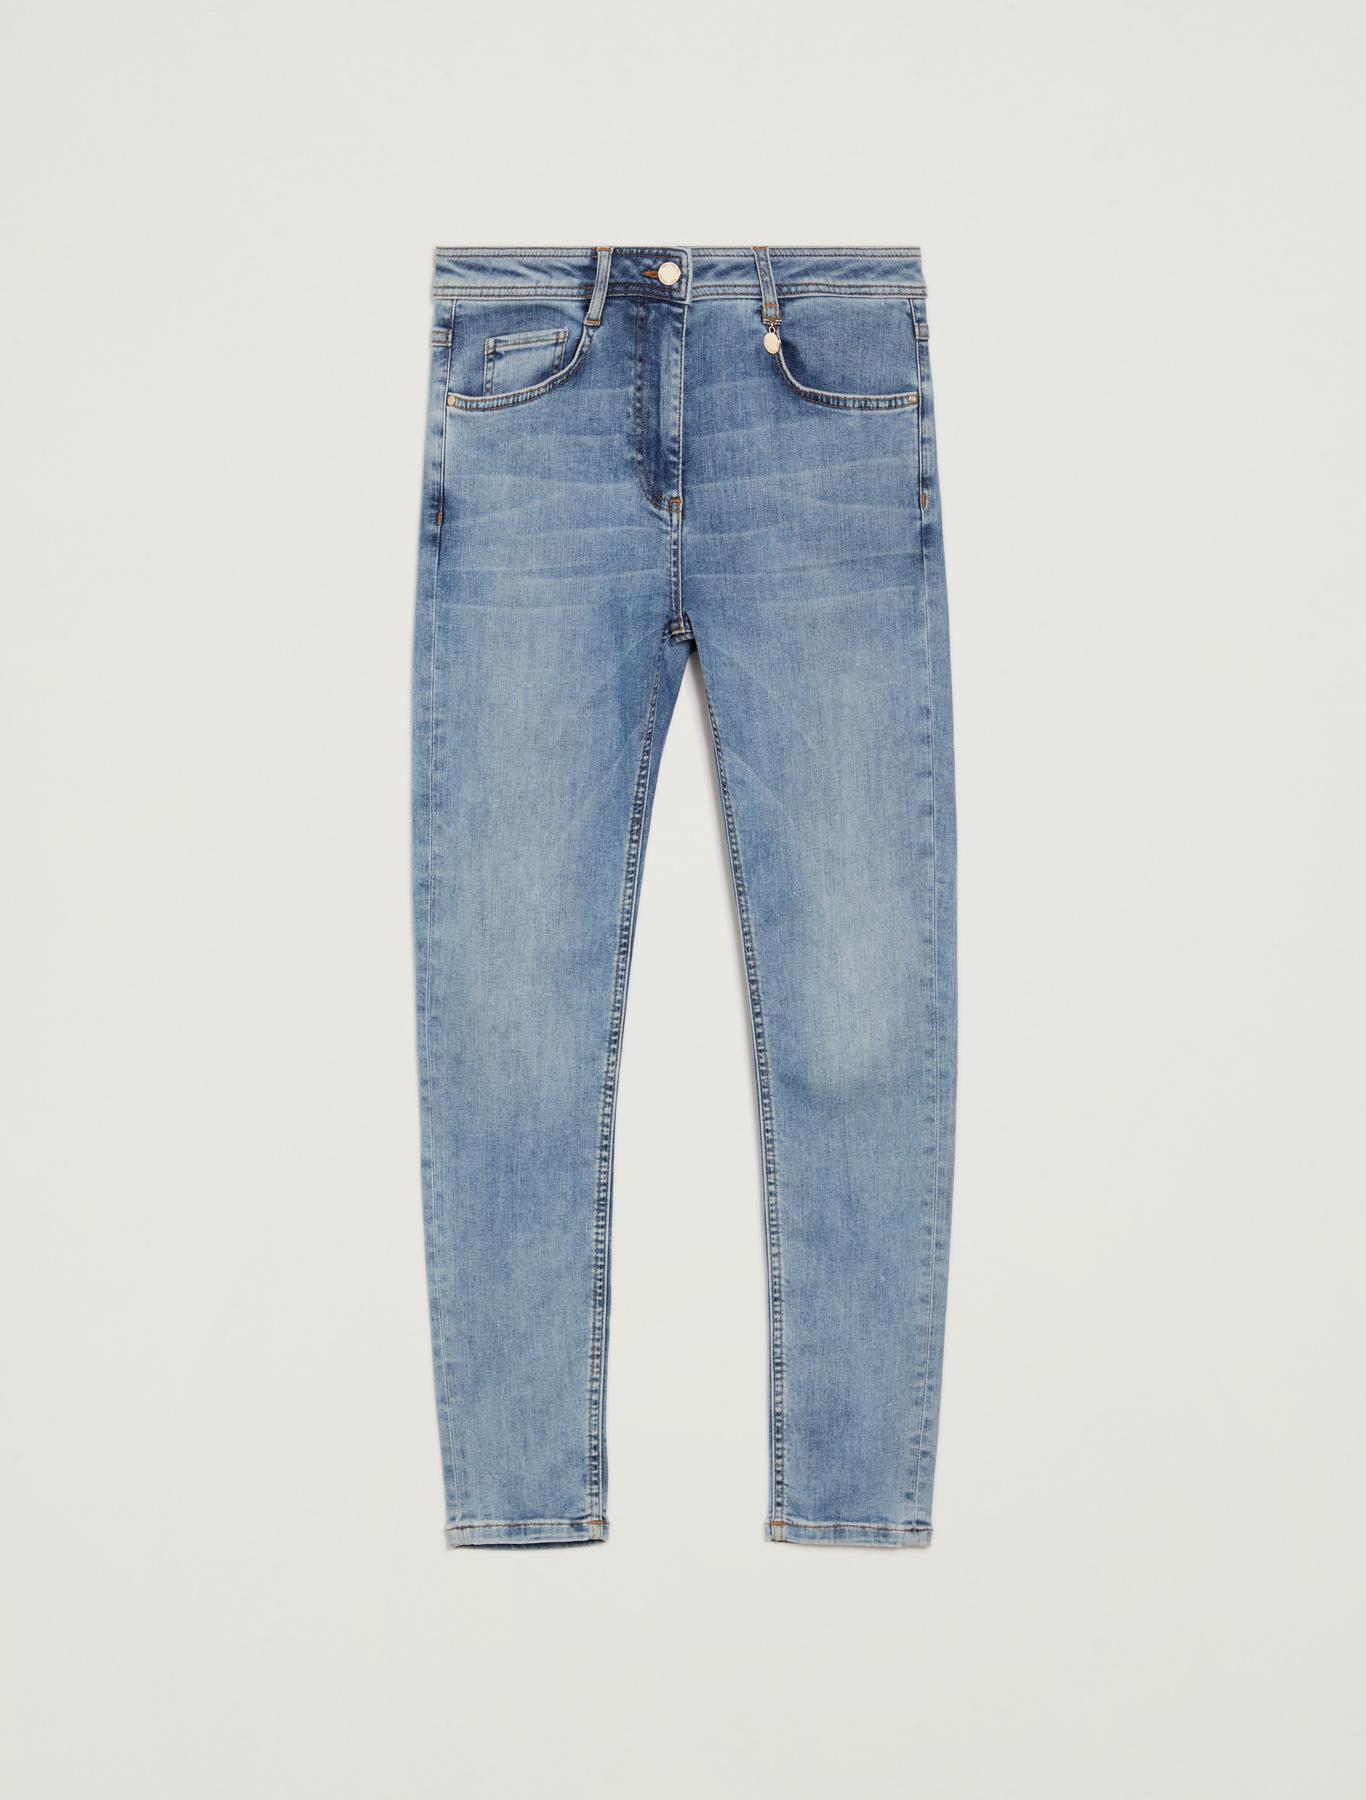 Super-stretch skinny jeans - midnight blue - pennyblack